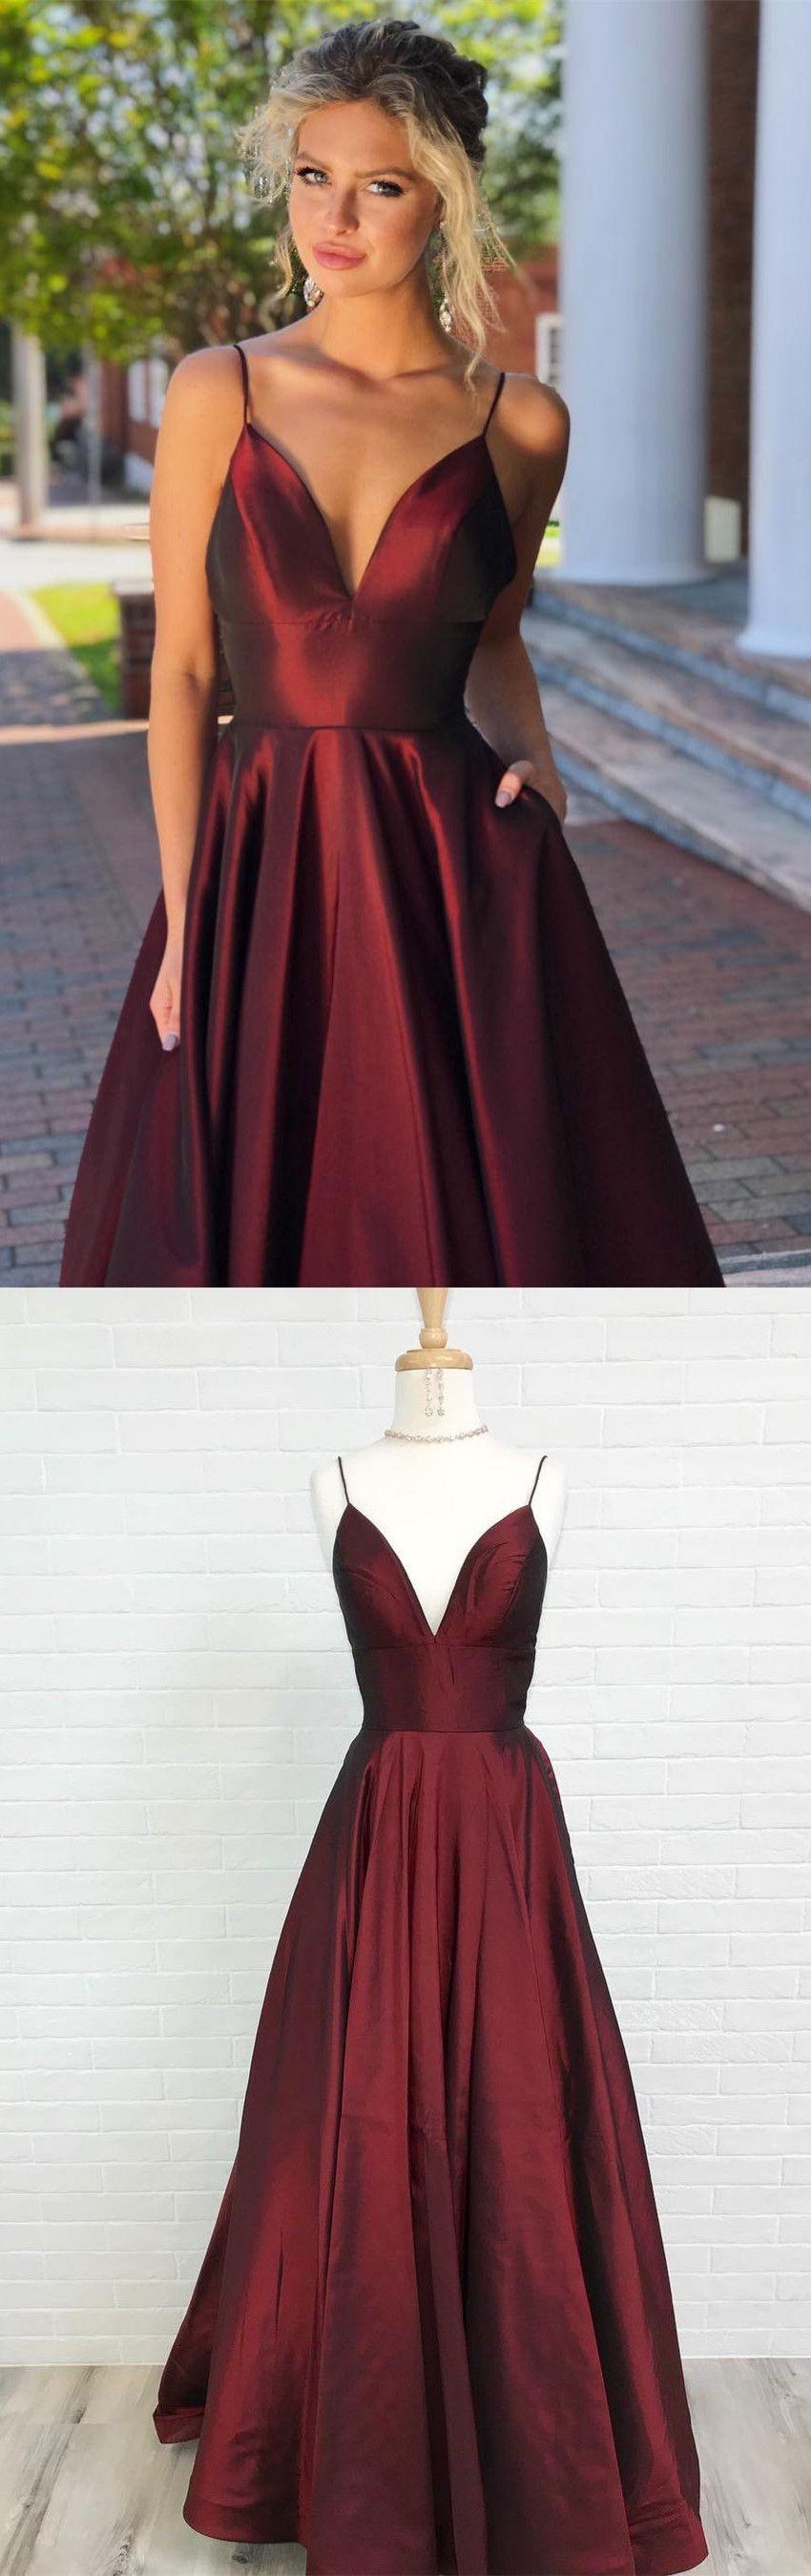 long prom dress homecoming dress simple straps burgundy long